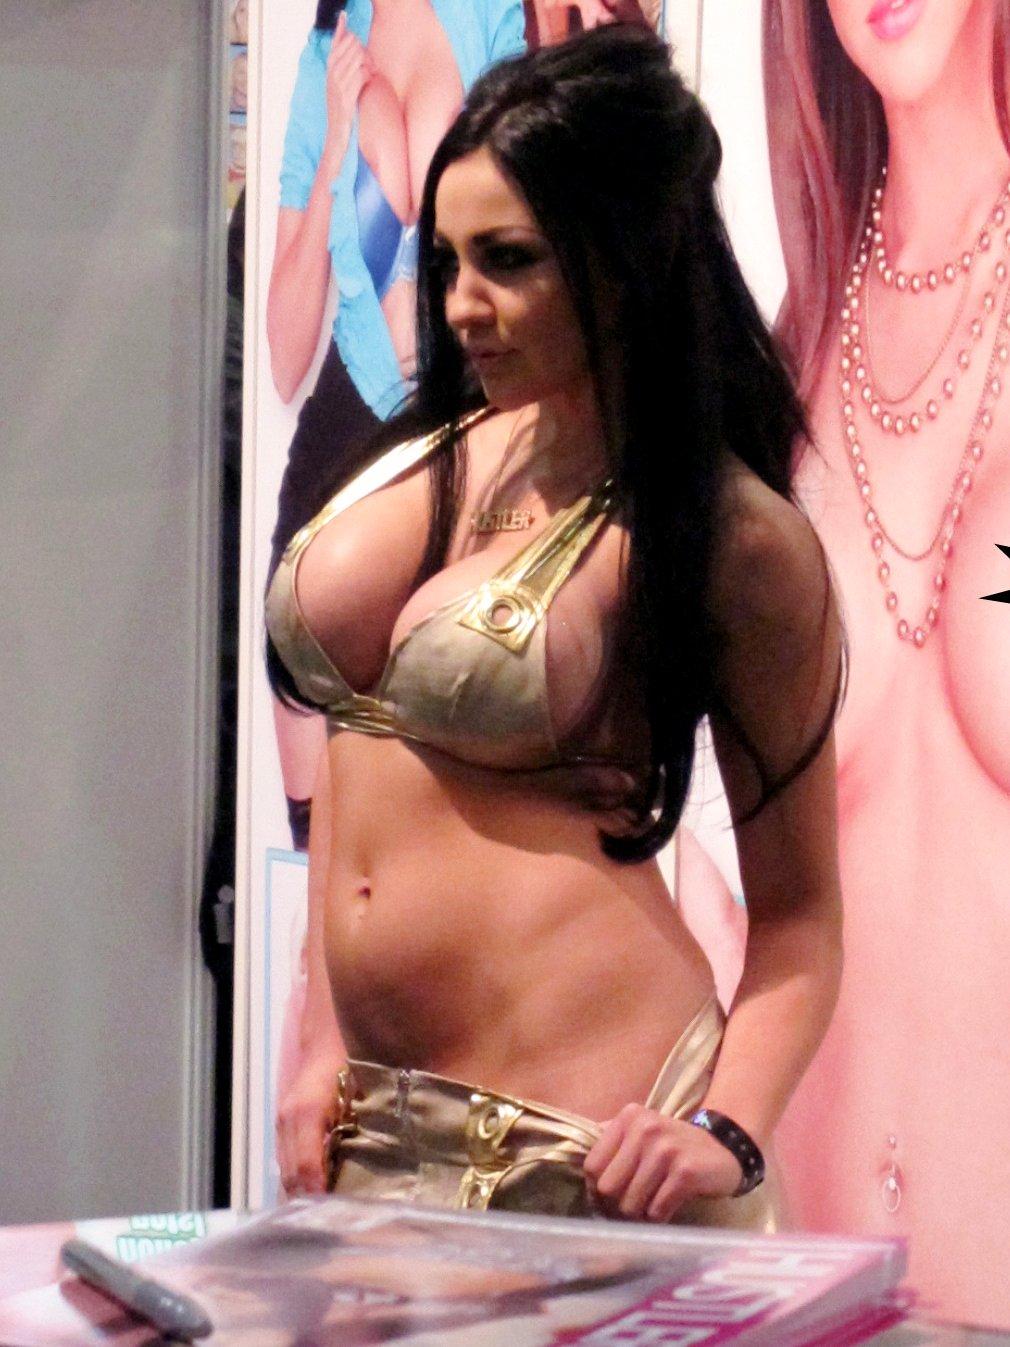 erotiic massage avn porn expo